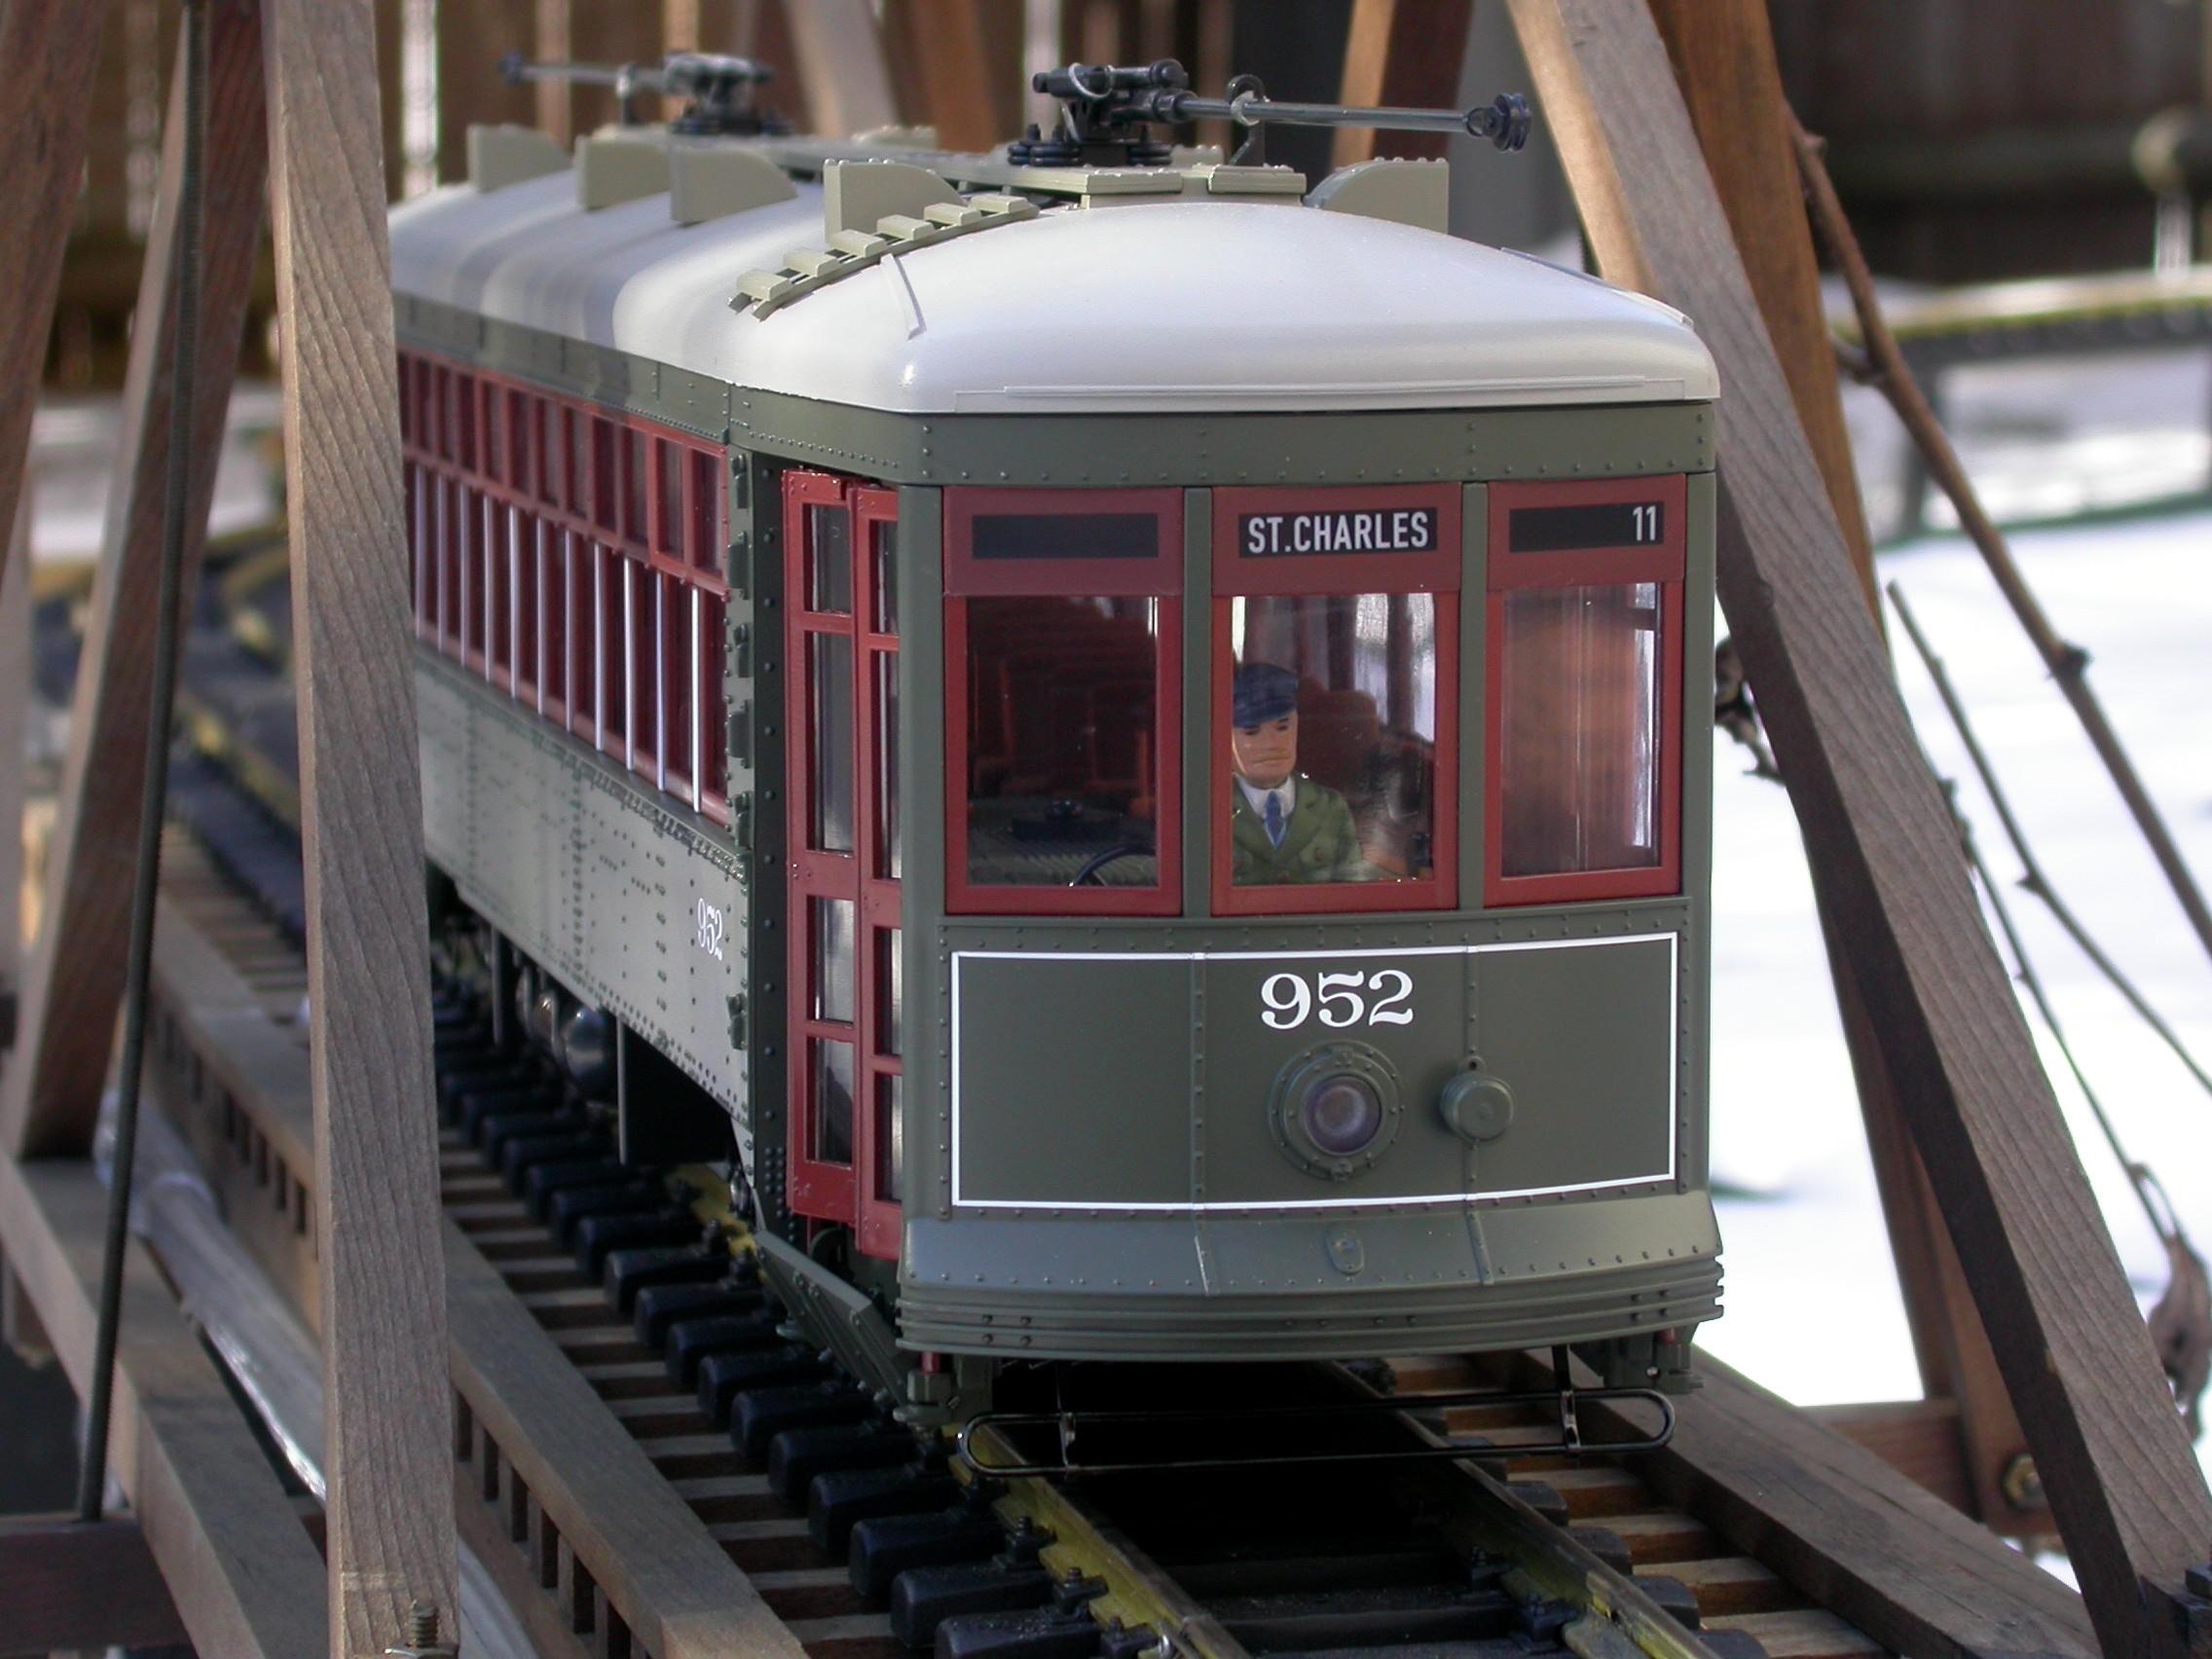 My backyard garden railway